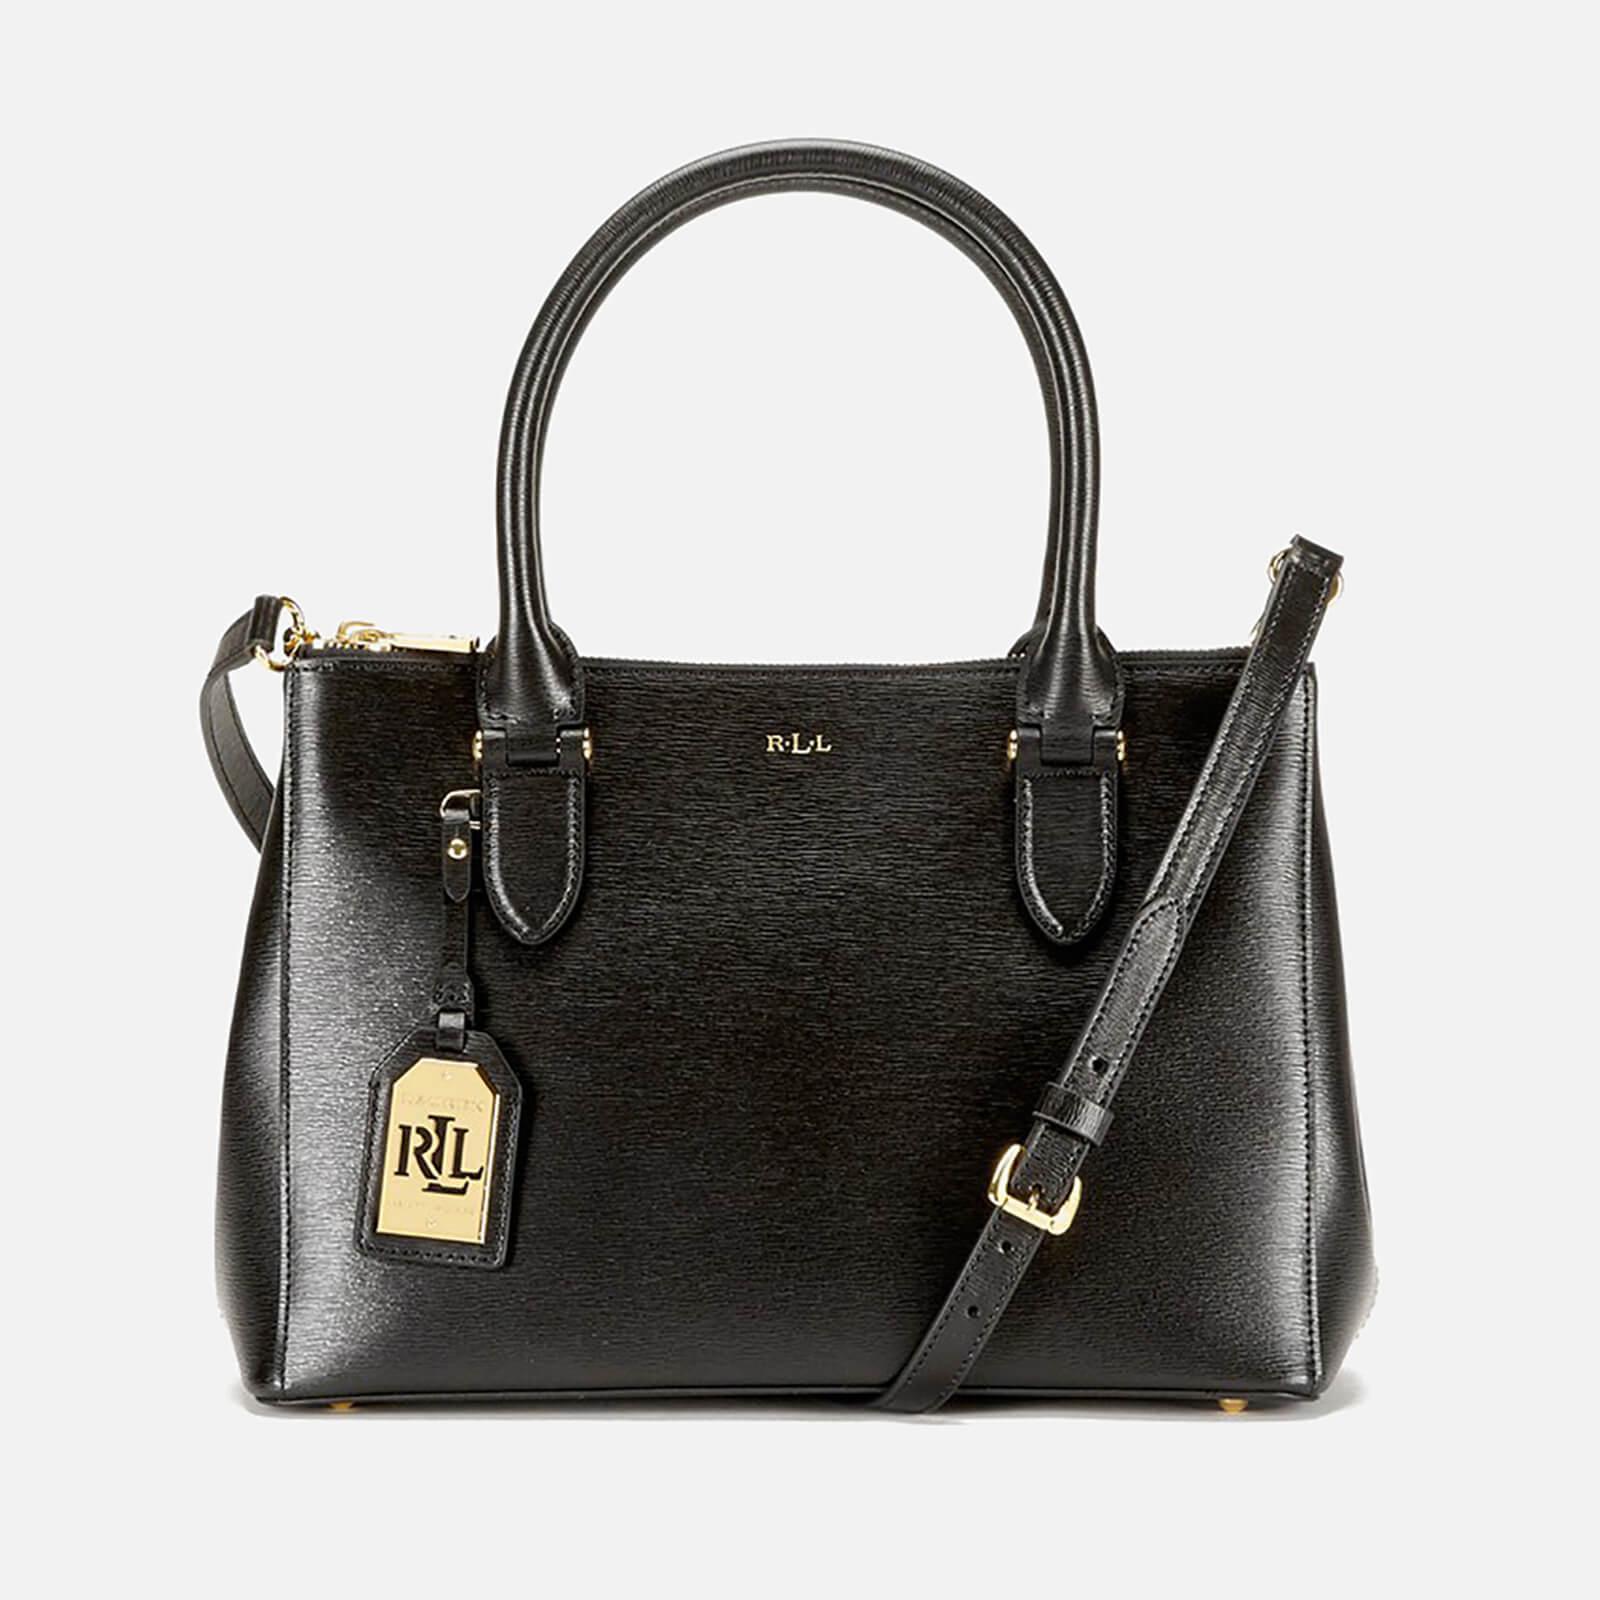 ac5d3b1c682 Lauren By Ralph Lauren Newbury Double Zipper Shopper Bag in Black - Lyst